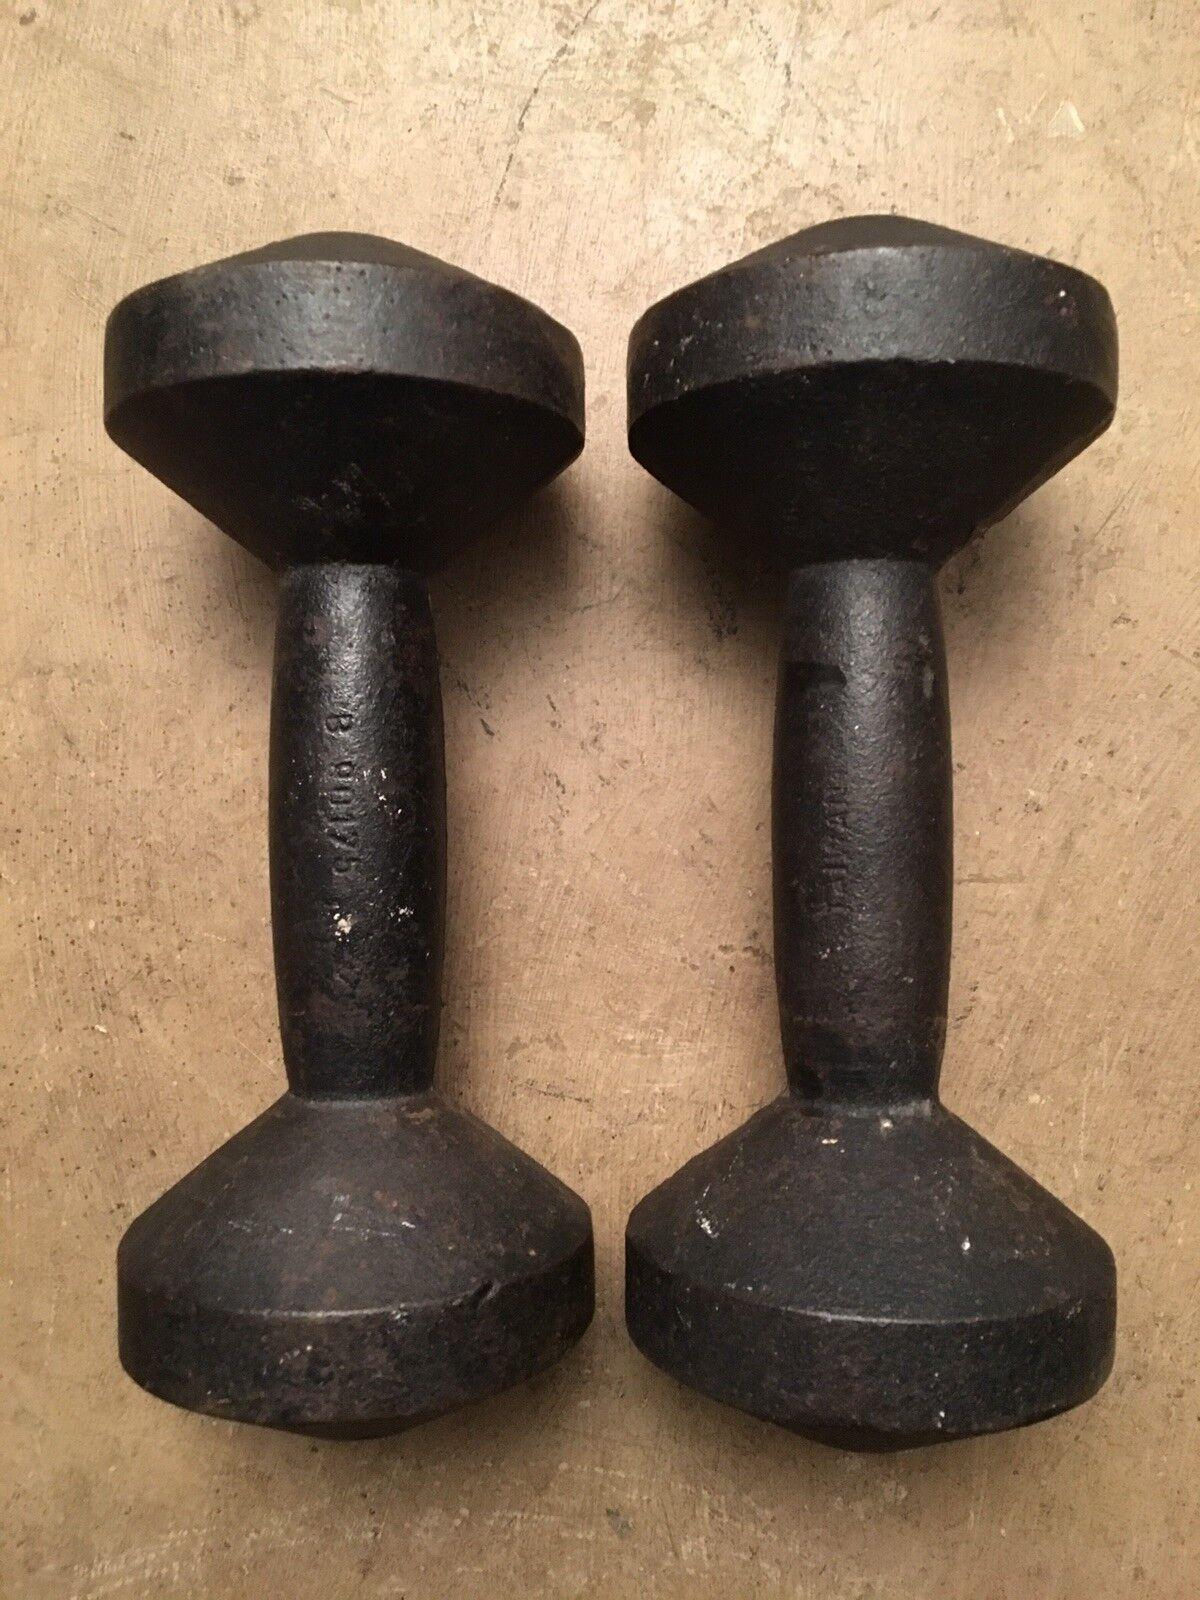 Vintage Pair Cast Iron Bun End Dumbbells Hand Weights Barbells 20 Lb X 2 = 40lb